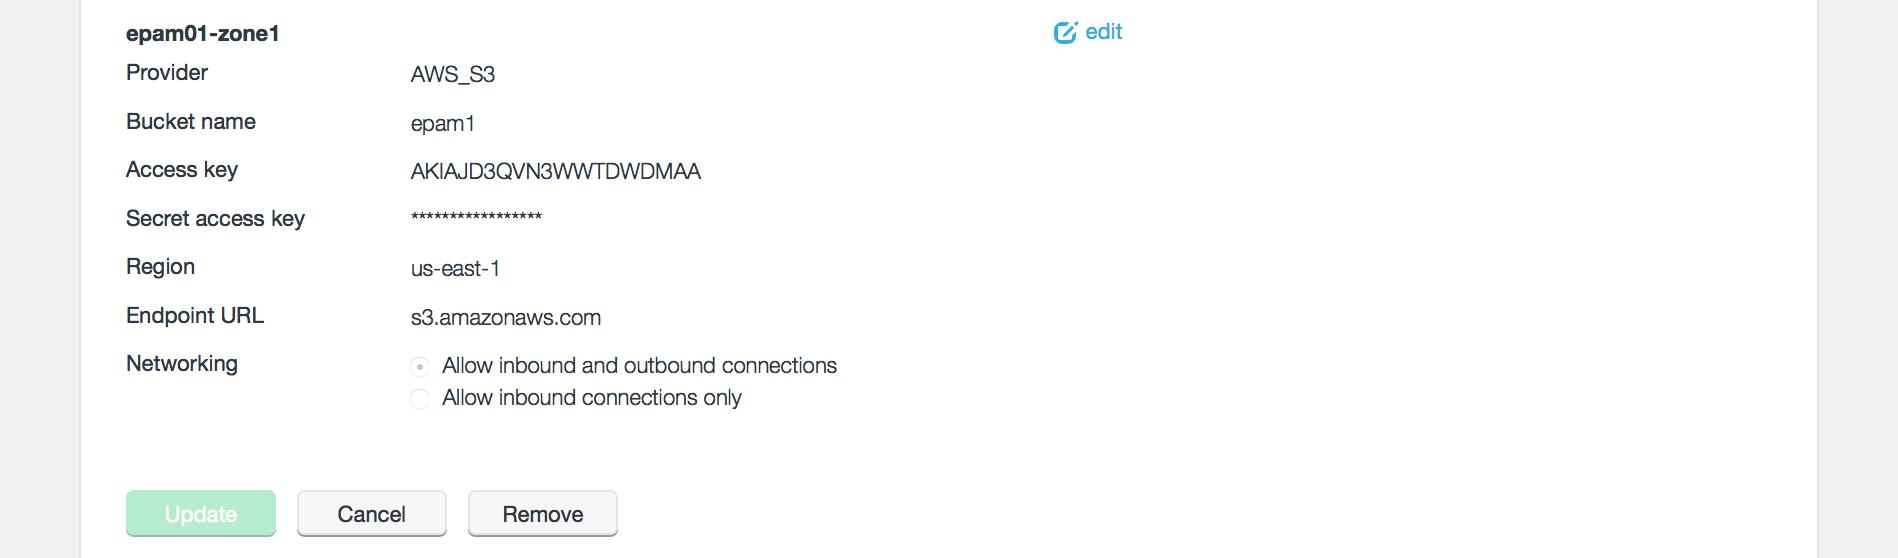 WANdisco Fusion Plugin Guide